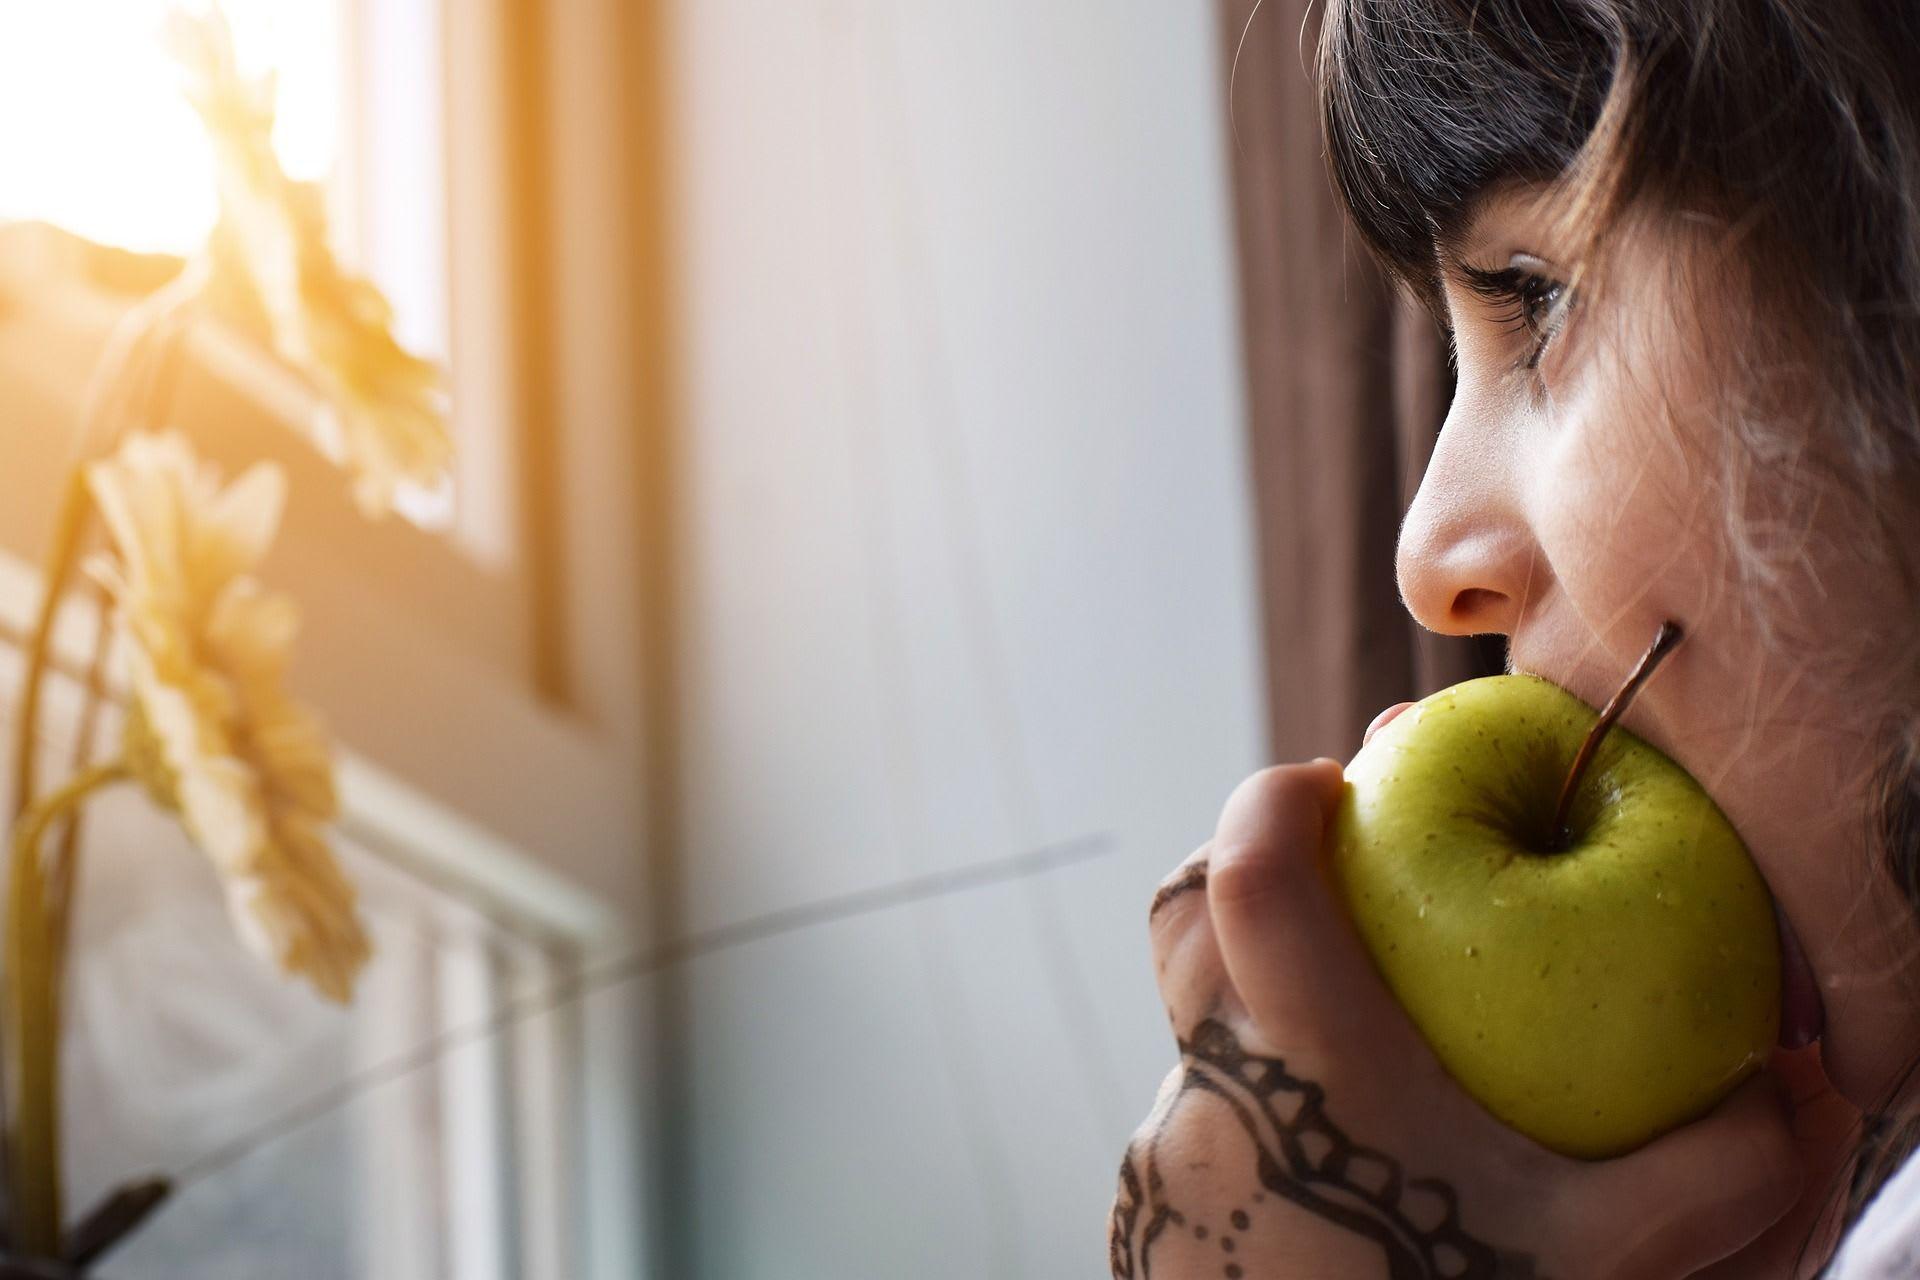 Nueva DIPLOMATURA UNIVERSITARIA en Mindfulness y Conducta Alimentaria 2021.